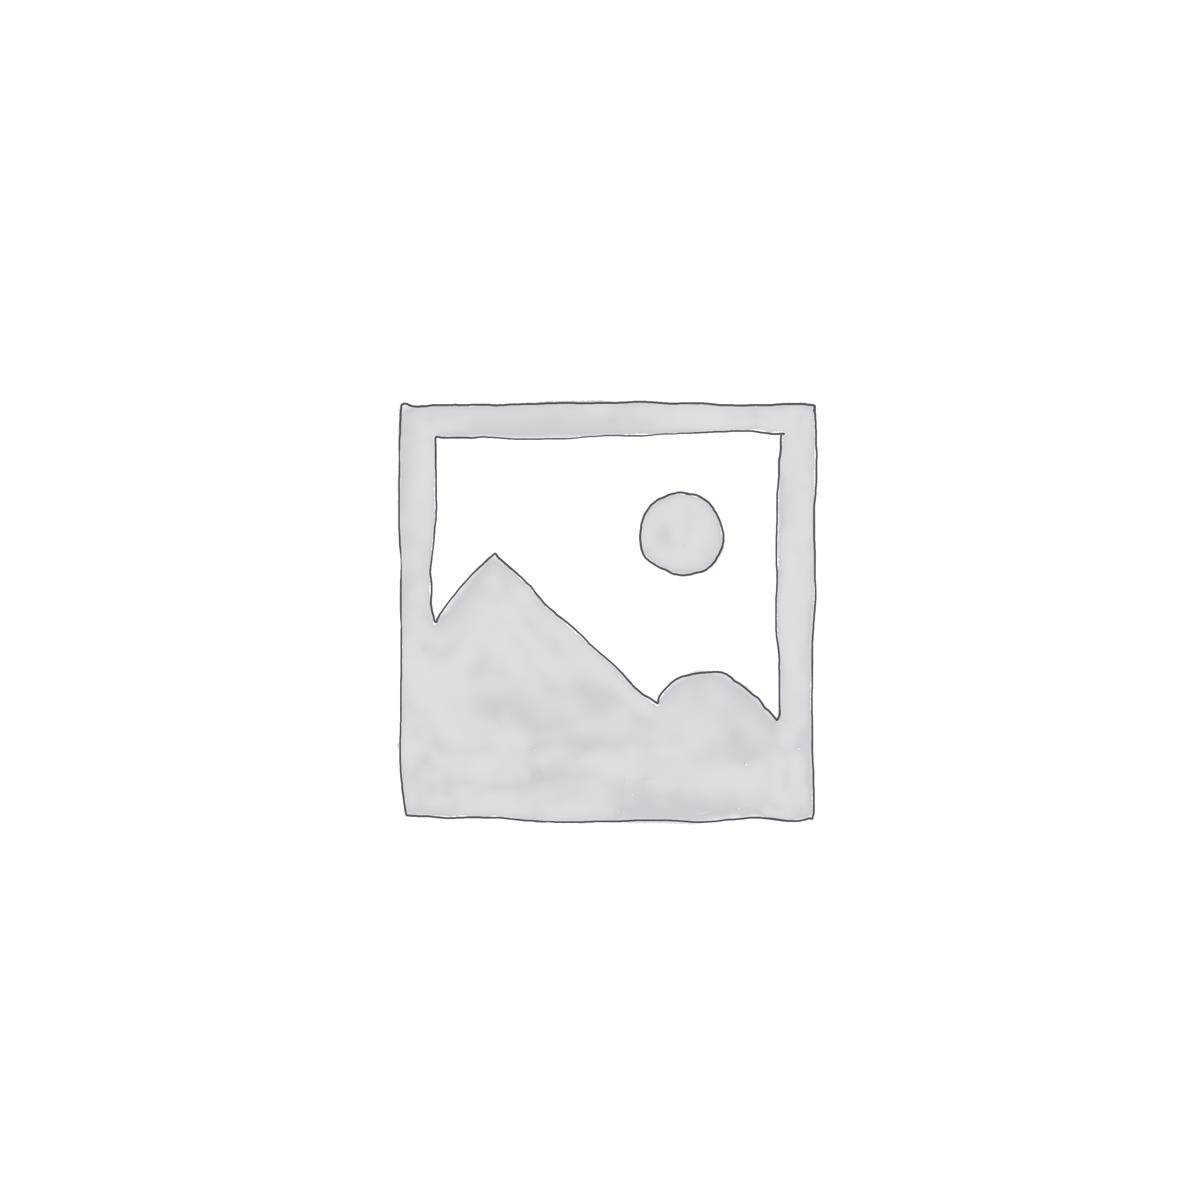 Golden Swarovski Floral Wallpaper Mural